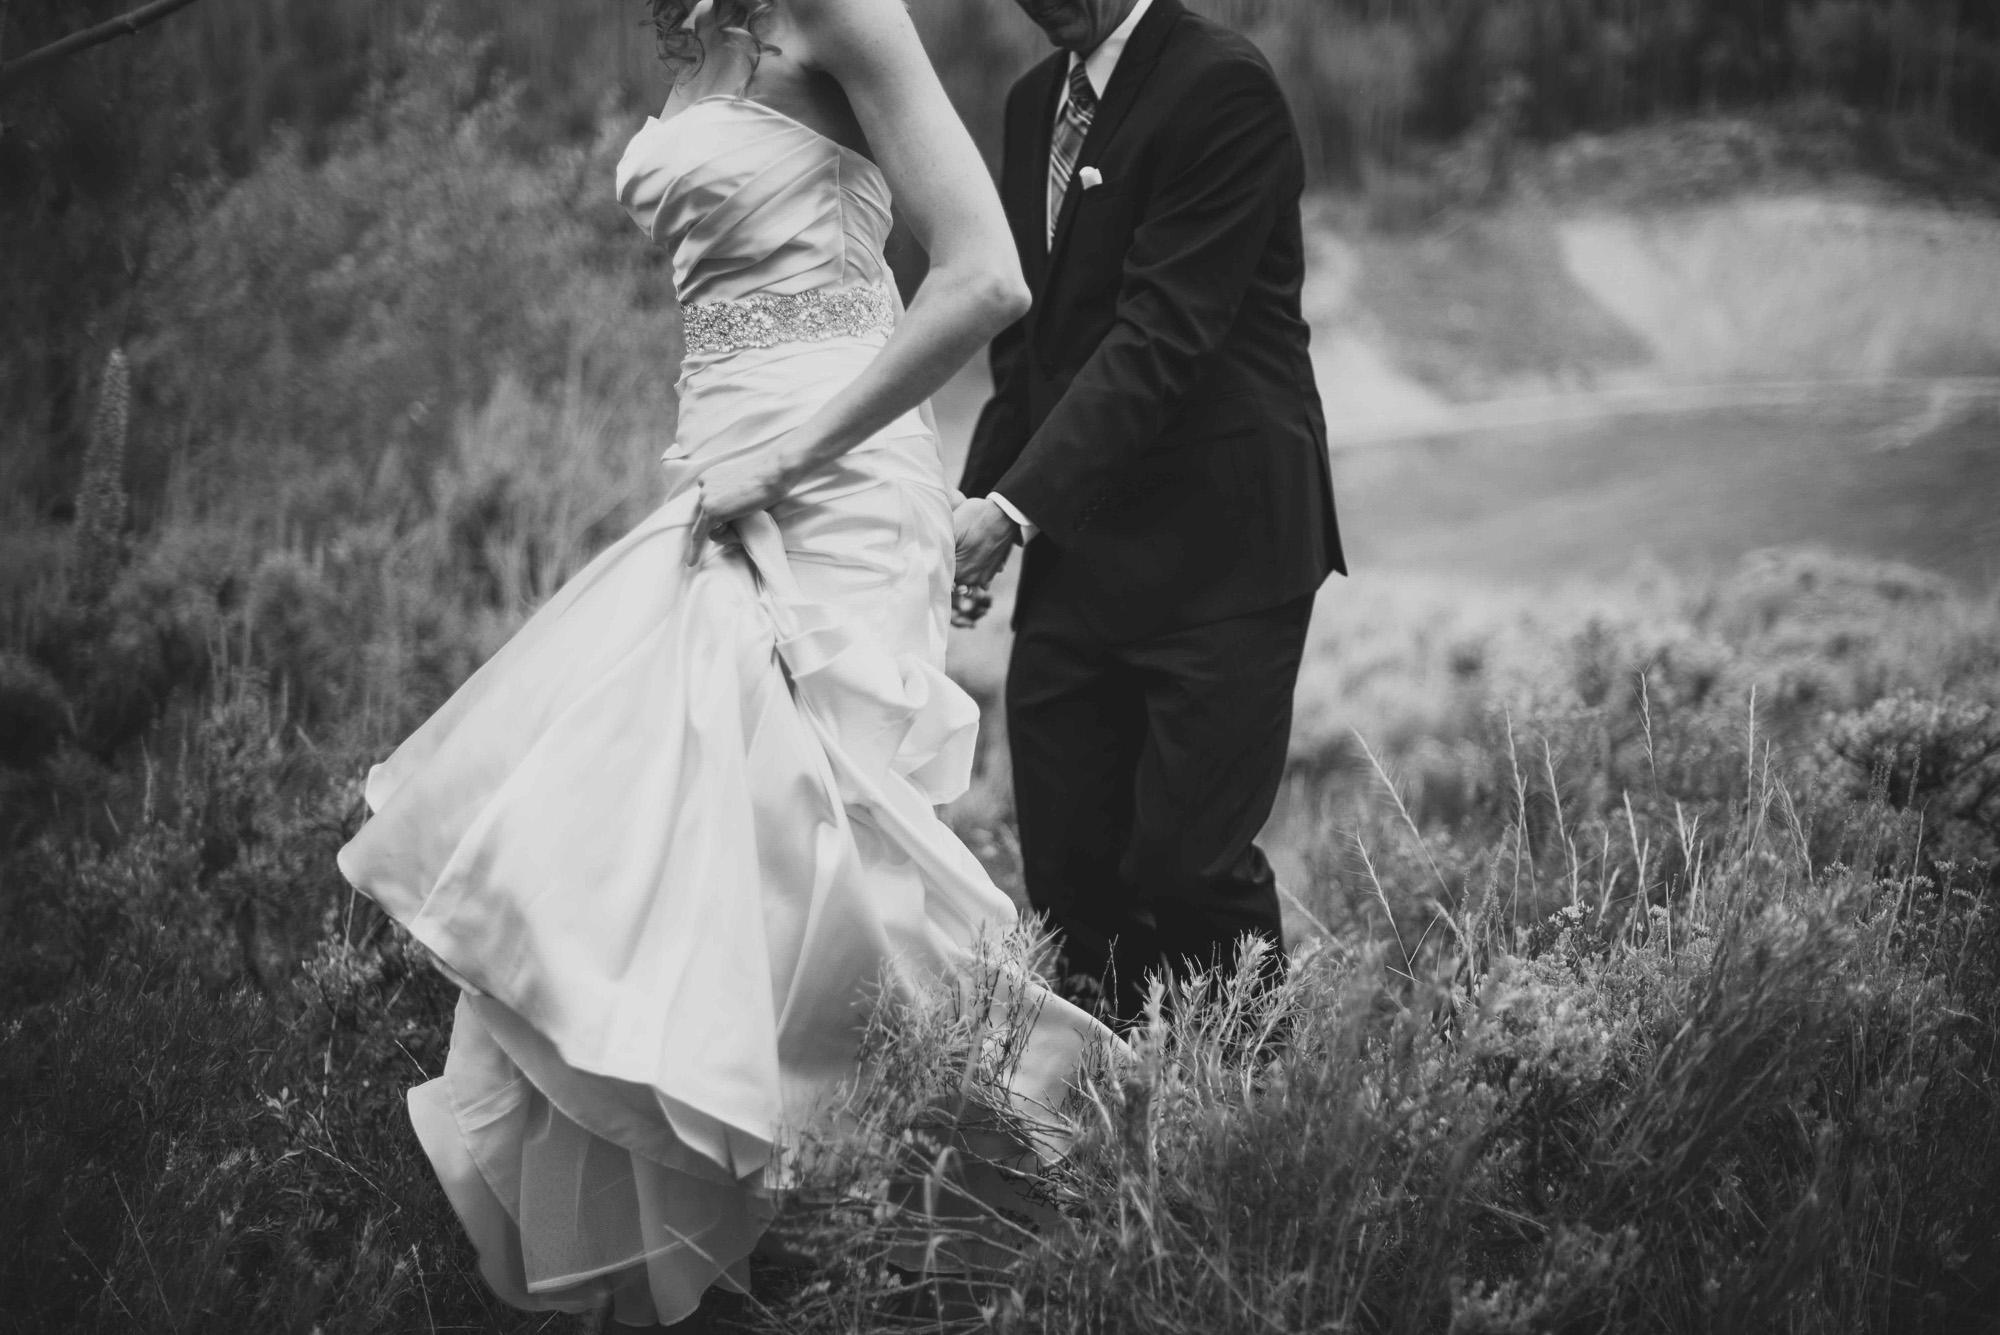 30elopement-photographer-colorado-snow-mountain-ranch-wedding-cynthia&chris-married1169_bw.jpg